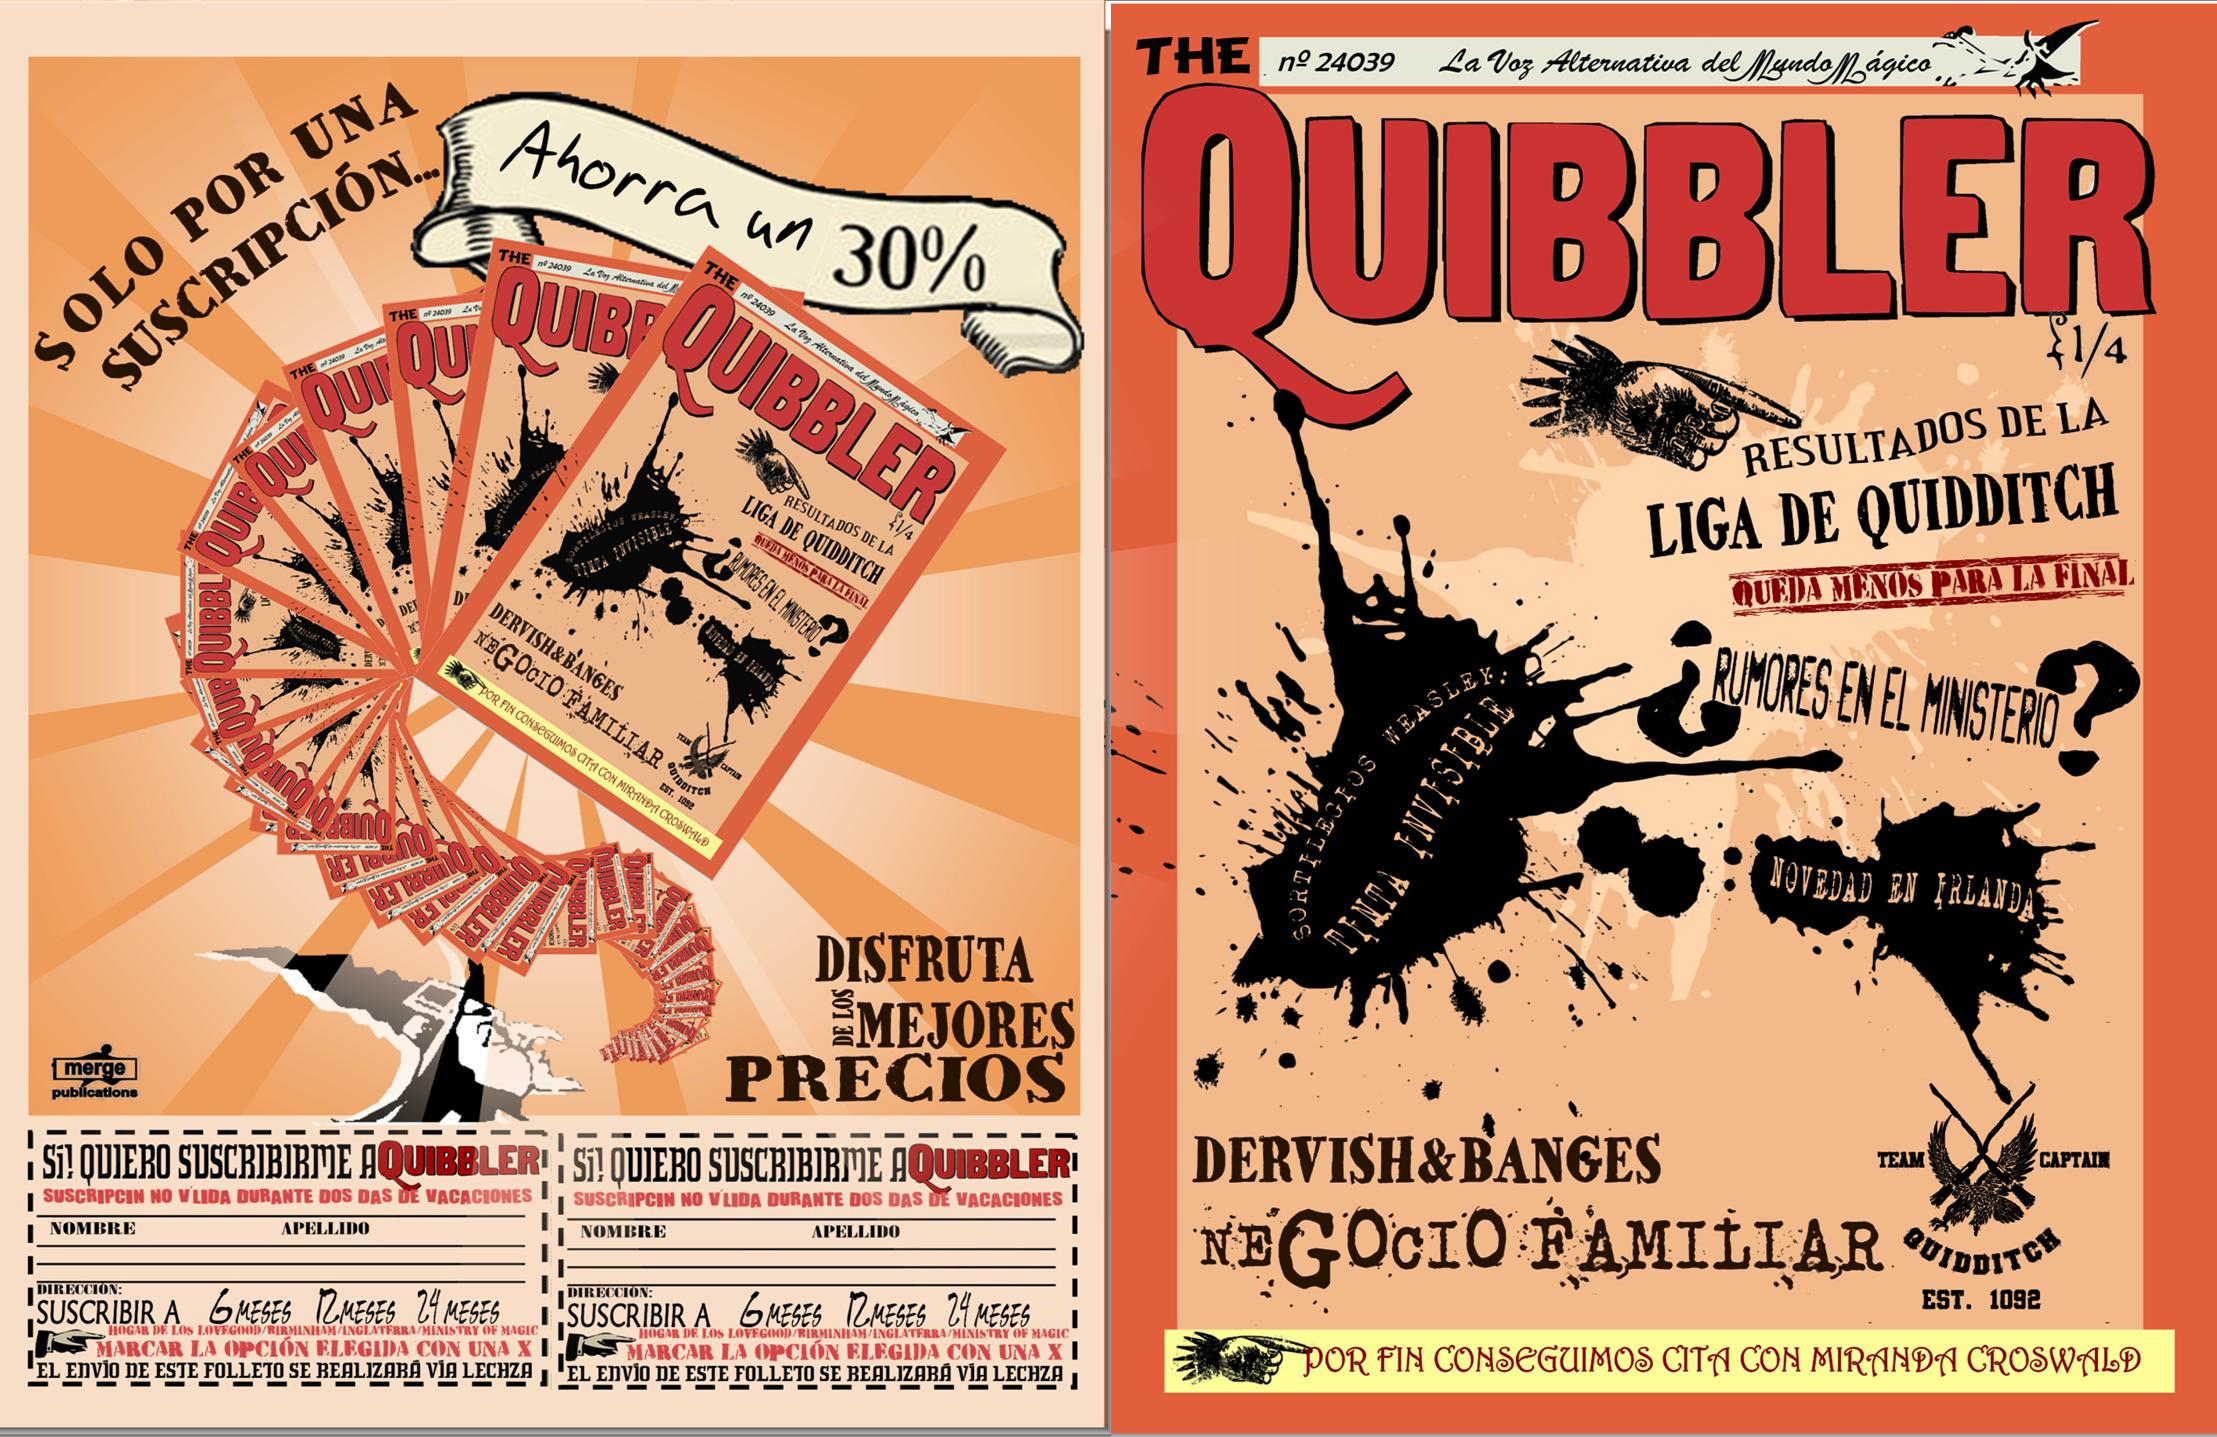 Quibbler Cover The Spanish Quibbler C...